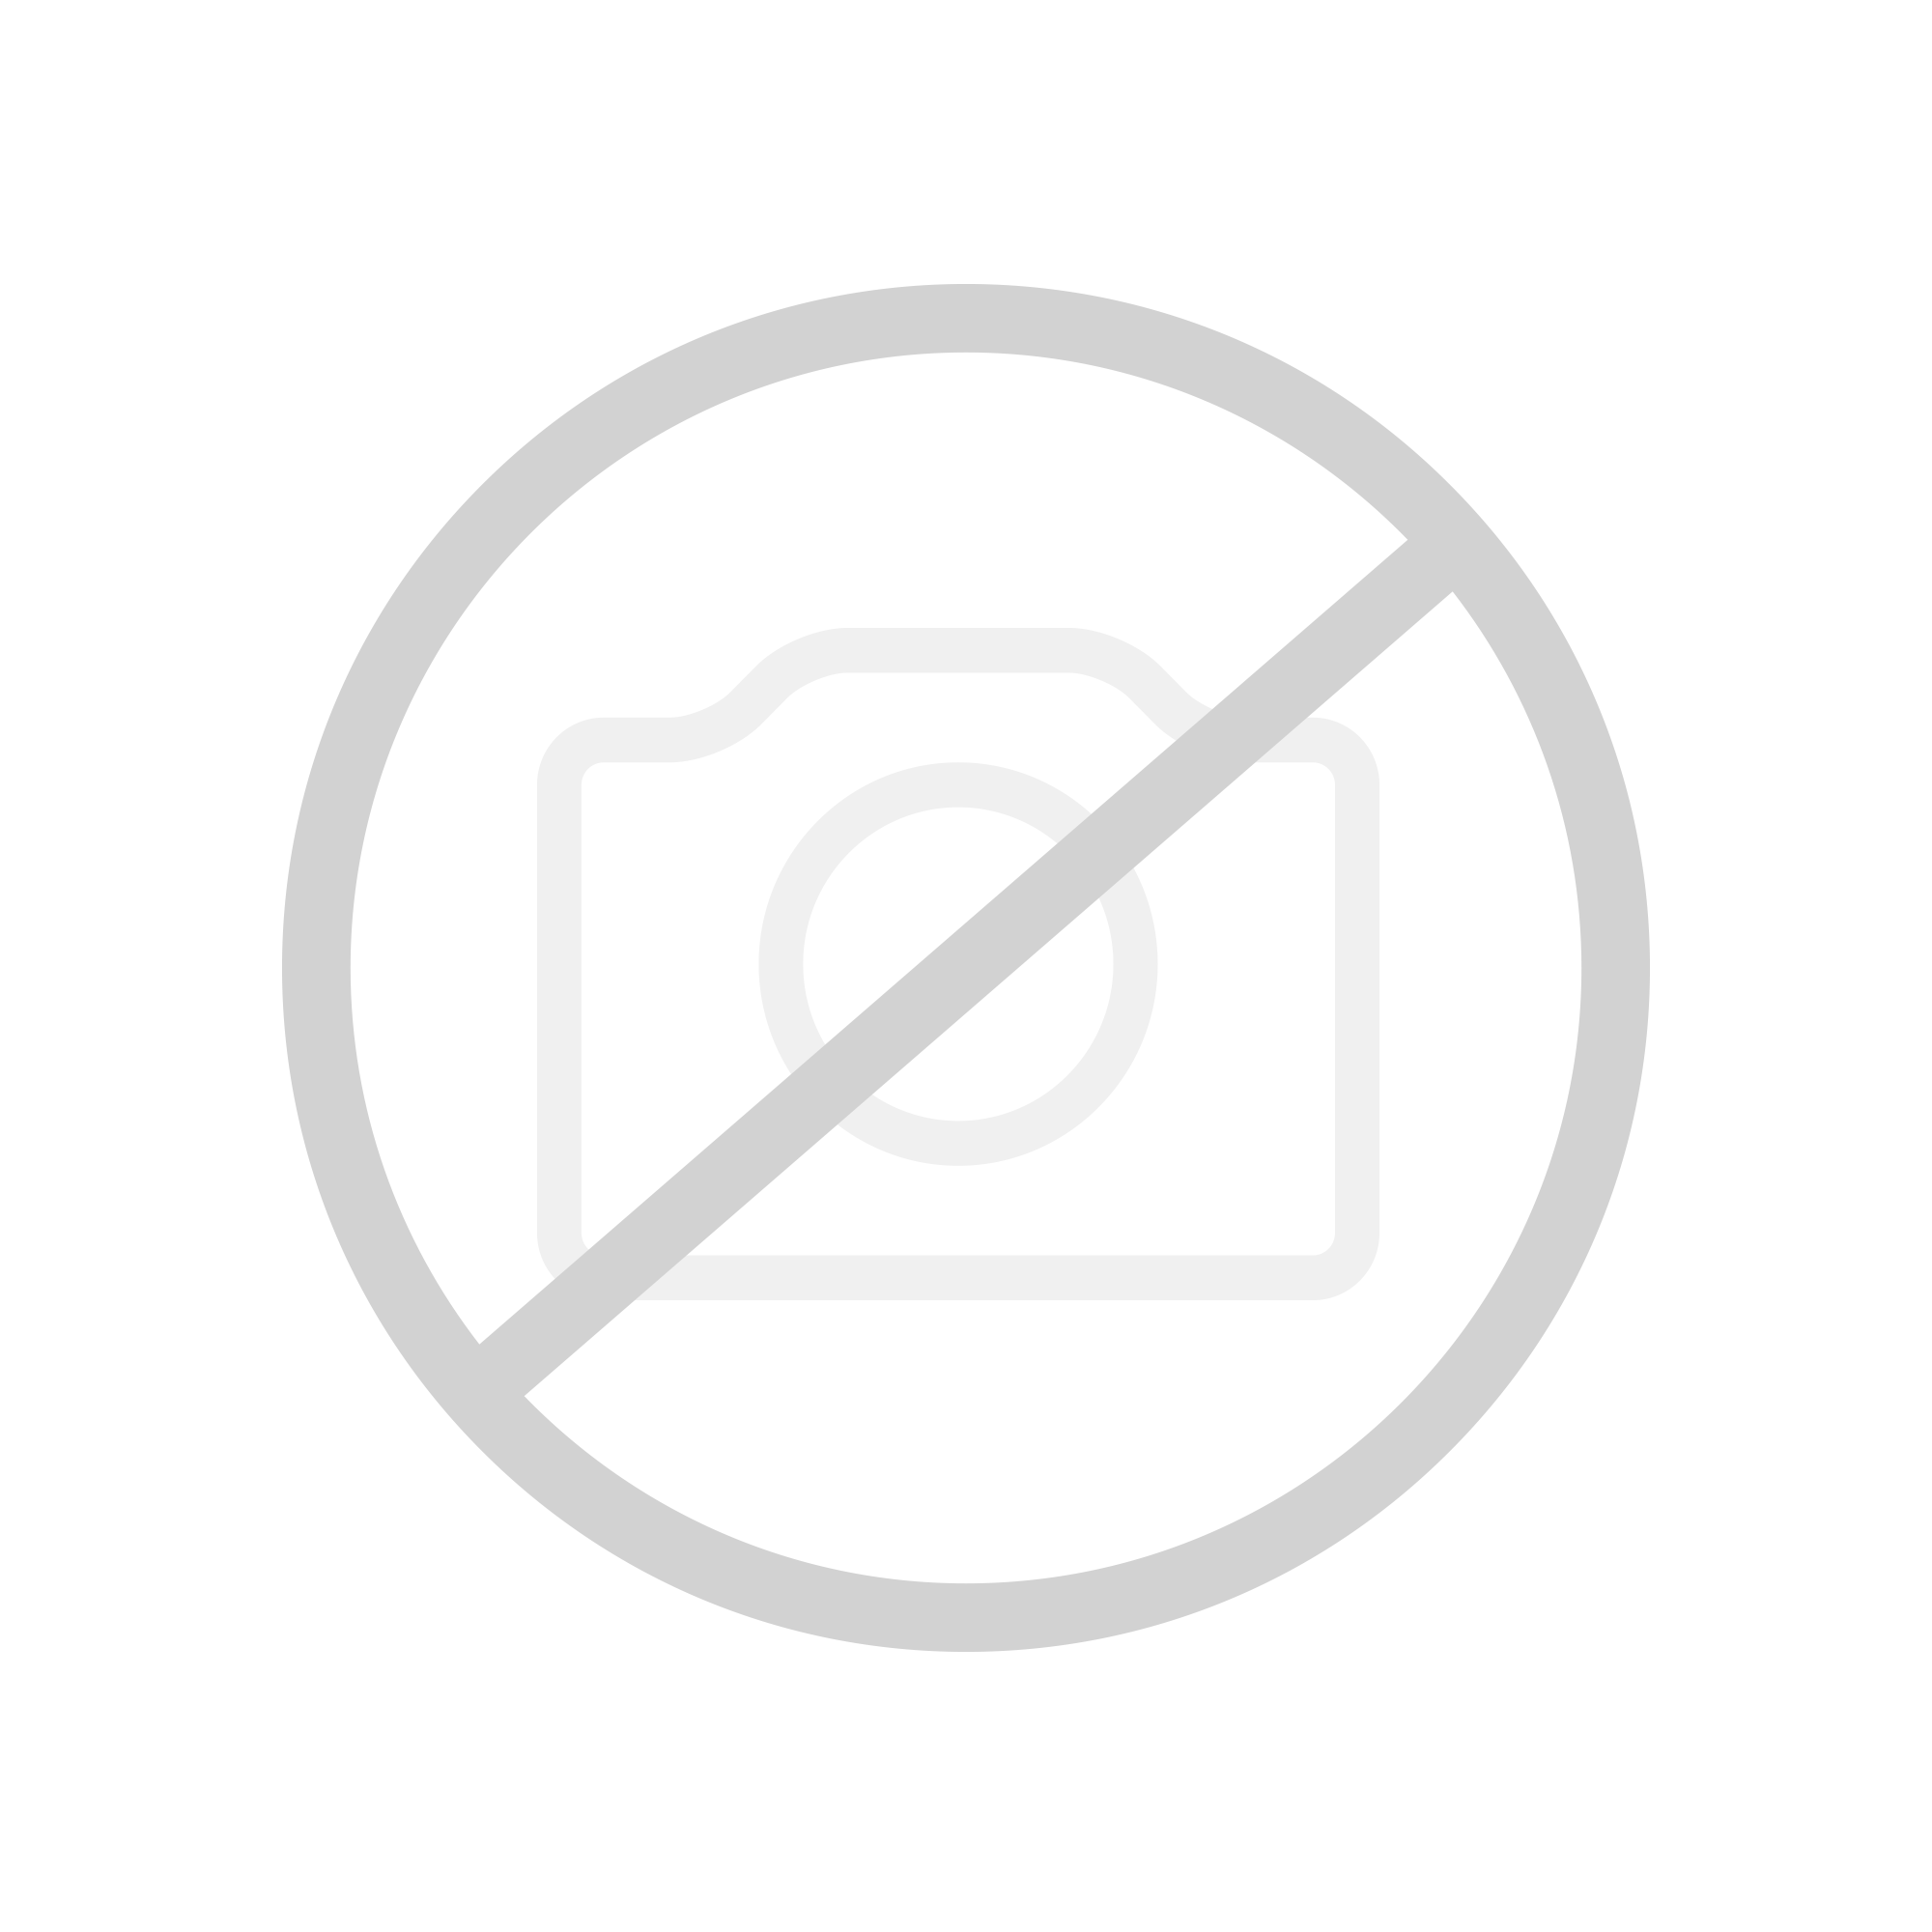 villeroy boch artis aufsatzwaschtisch bi color french linen ohne berlauf 419861bct7 reuter. Black Bedroom Furniture Sets. Home Design Ideas